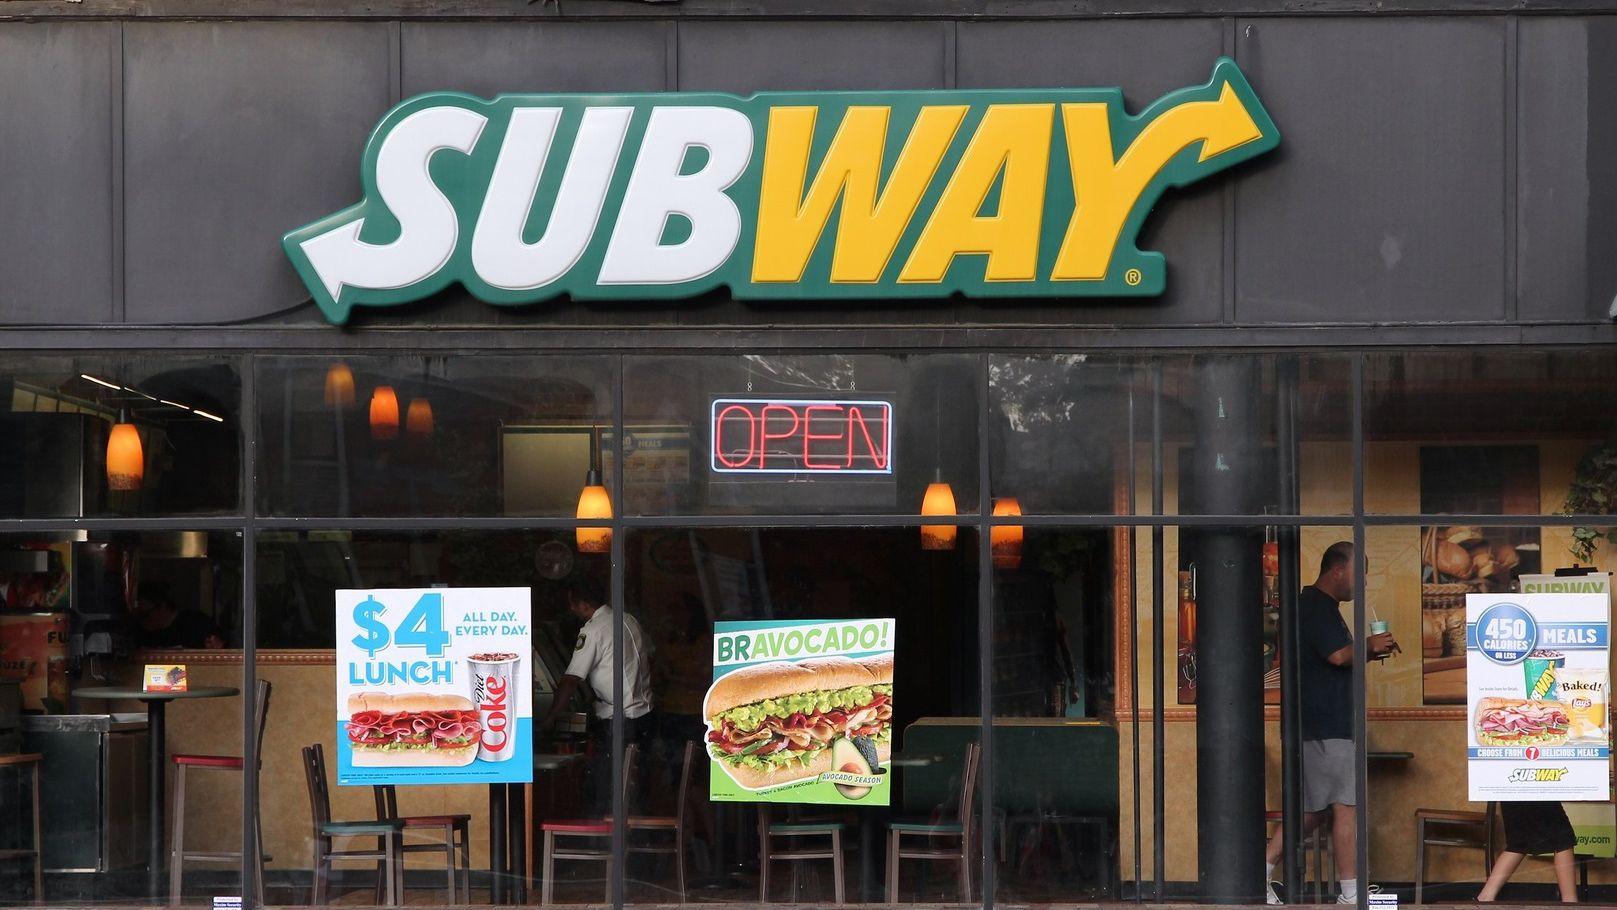 Subway Kids Menu: Health and